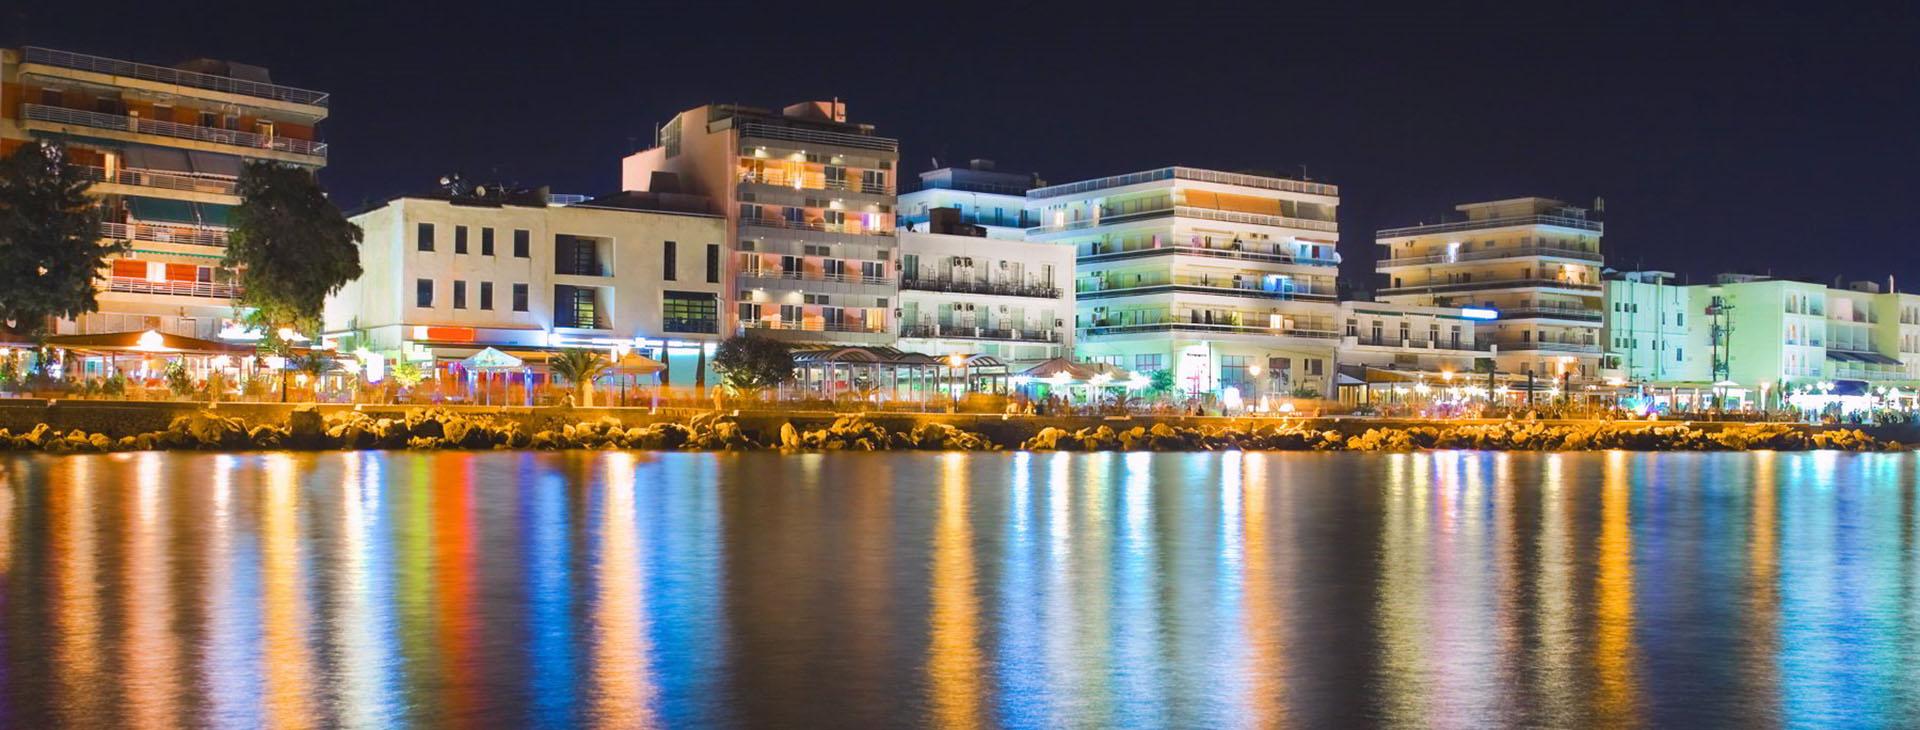 Loutraki by night, Corinthia